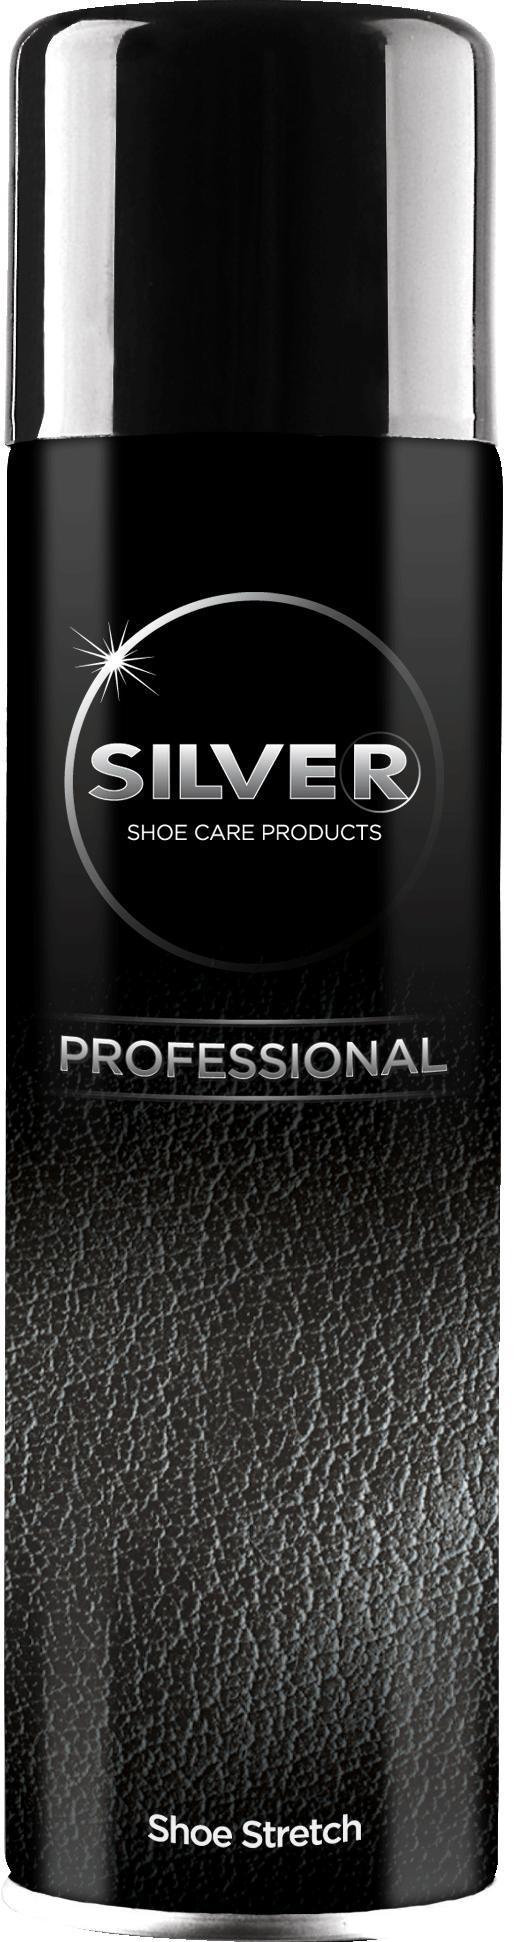 SILVER Professional Растяжитель 150 мл